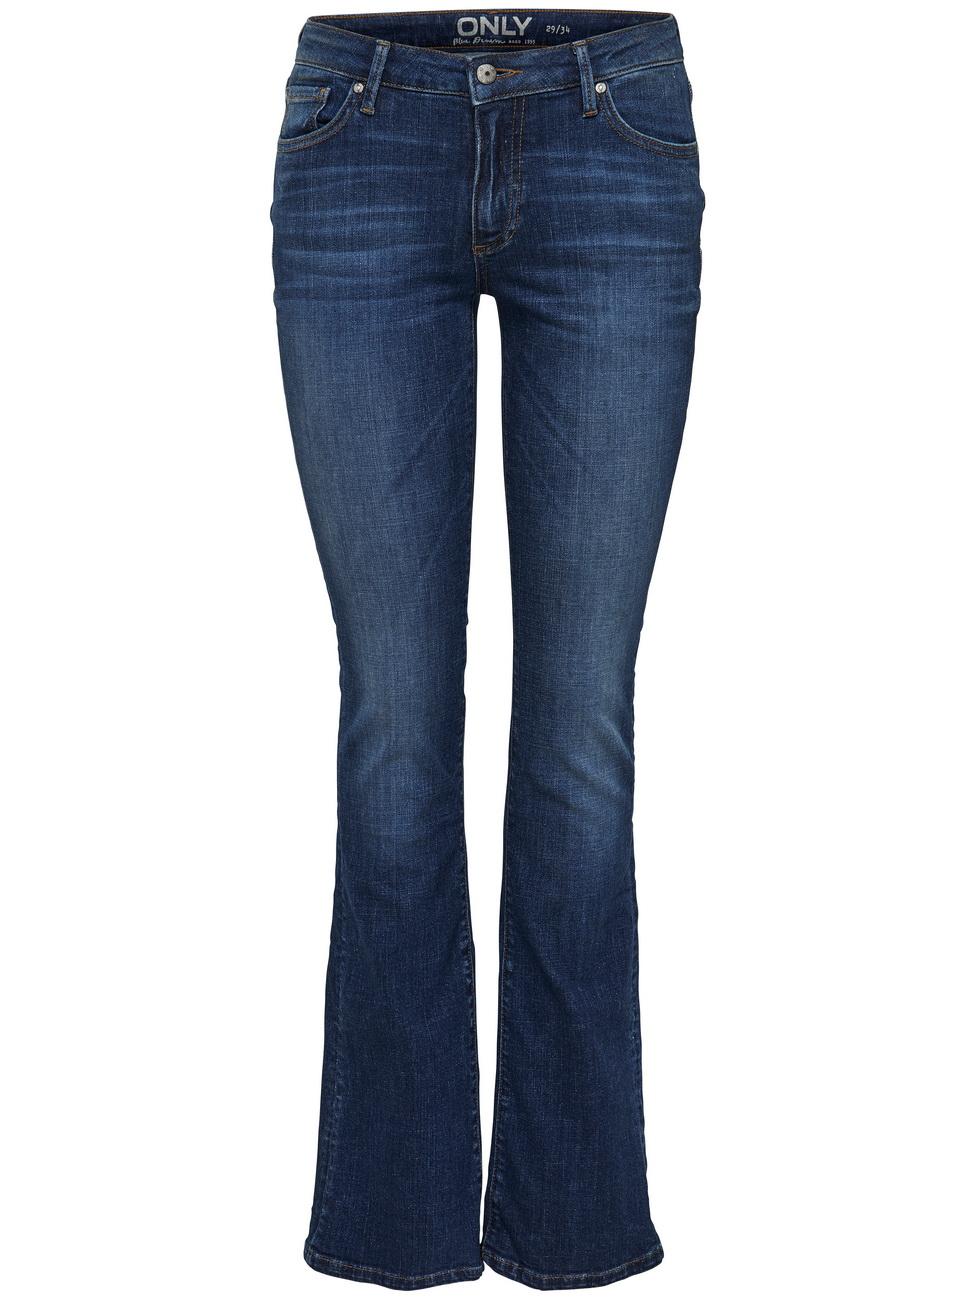 tom tailor damen jeanshose alexa blau mid stone wash denim 1052 w30 l30 herstellergr e 30. Black Bedroom Furniture Sets. Home Design Ideas